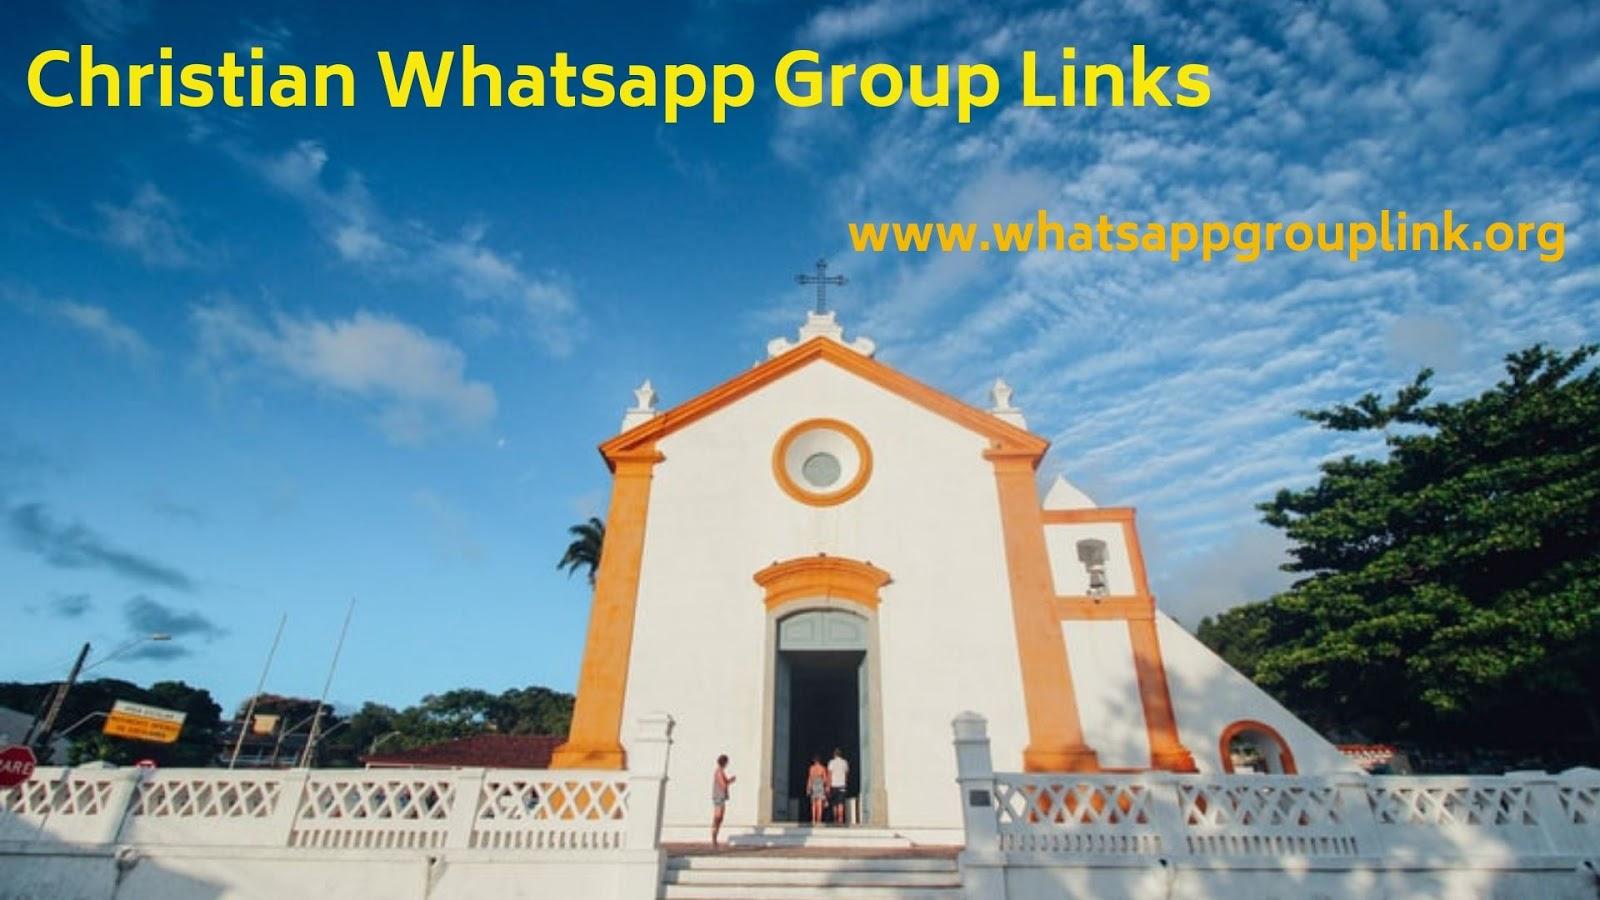 Whatsapp Group Link: Whatsapp Group Link